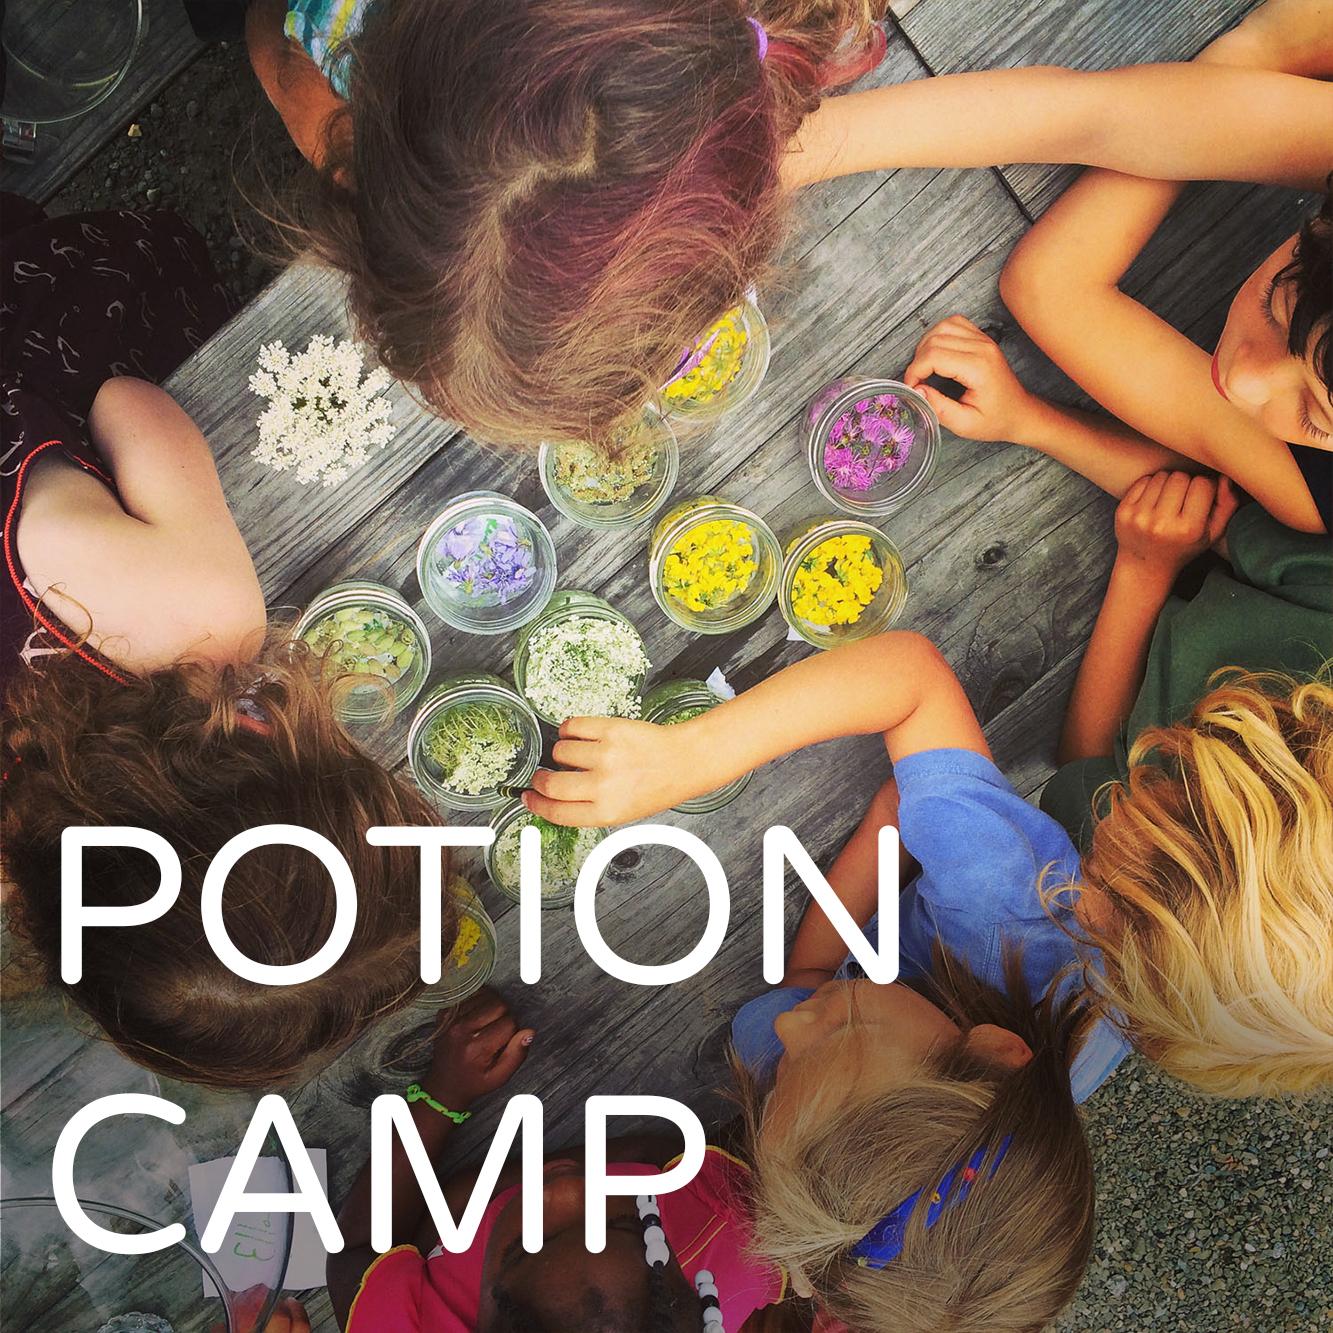 PotionCamp.jpg